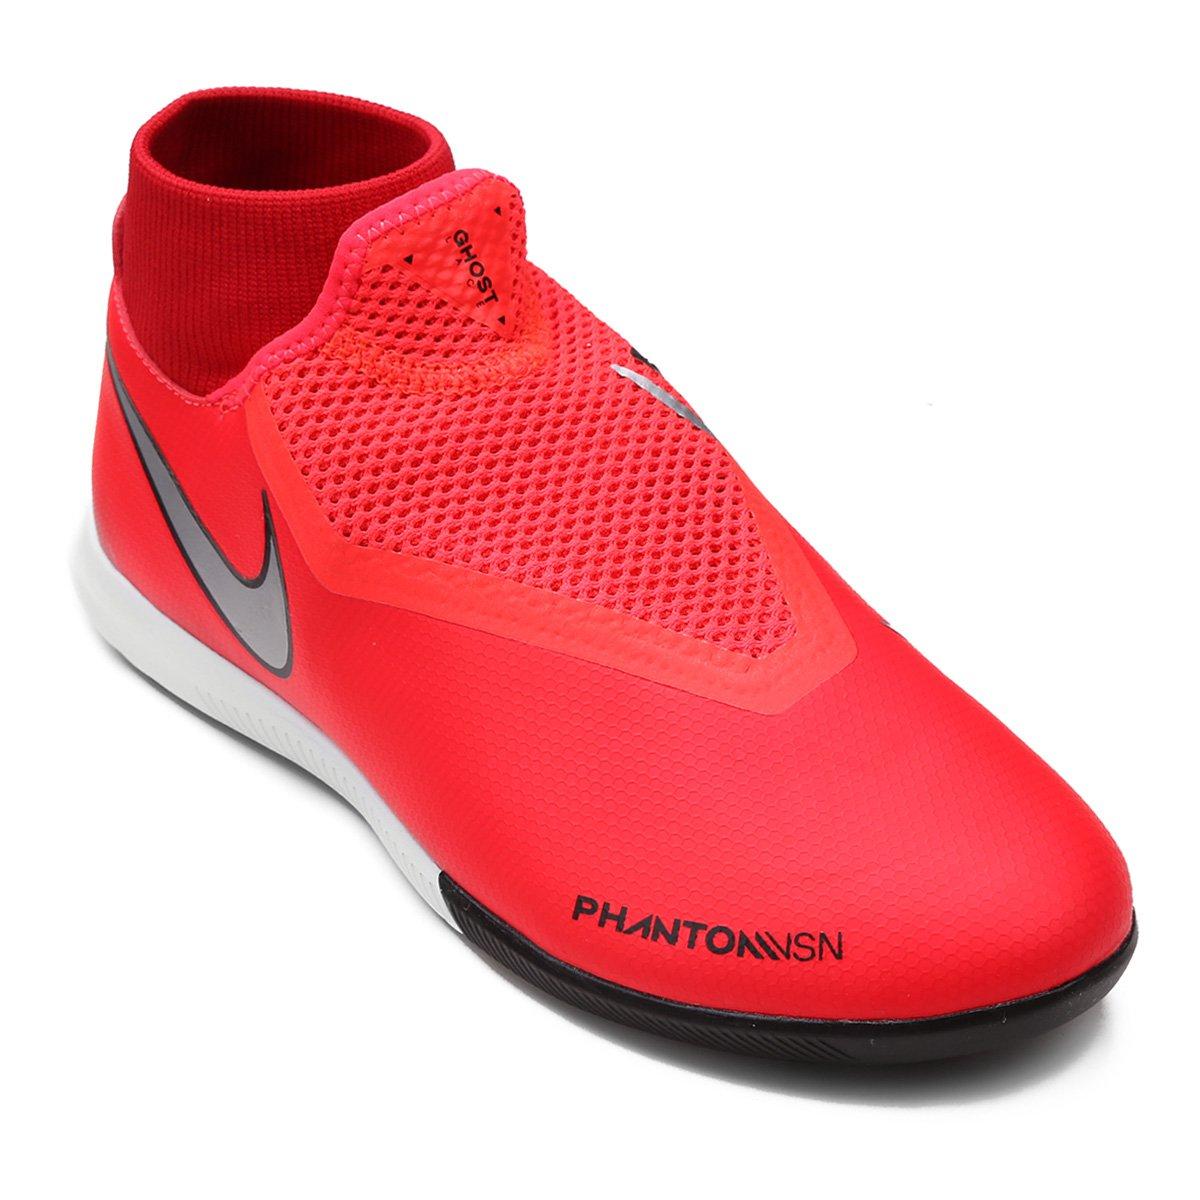 fee47f3974 Chuteira Futsal Nike Phantom Vision Academy DF IC